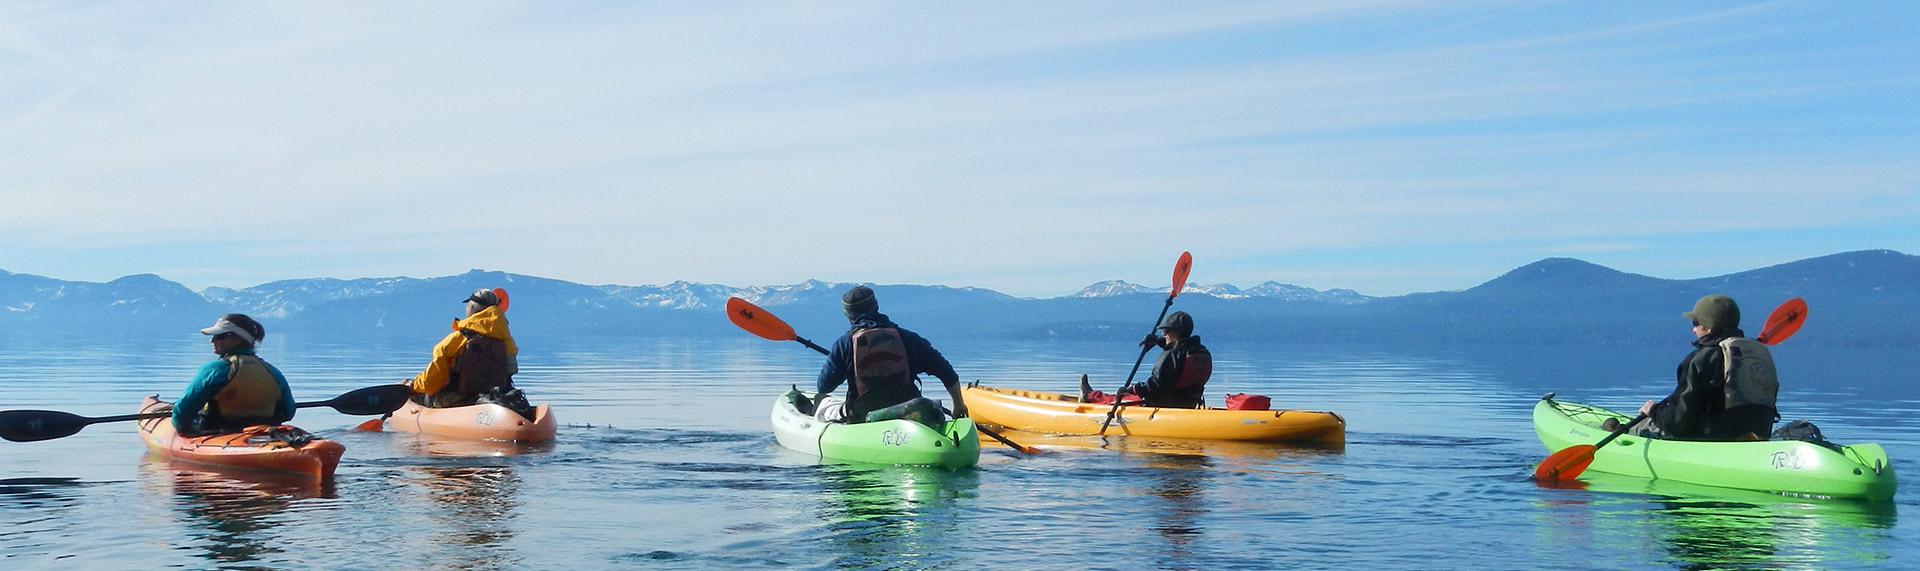 Sand Harbor State Park Kayak & SUP Rentals, Lessons & Tours